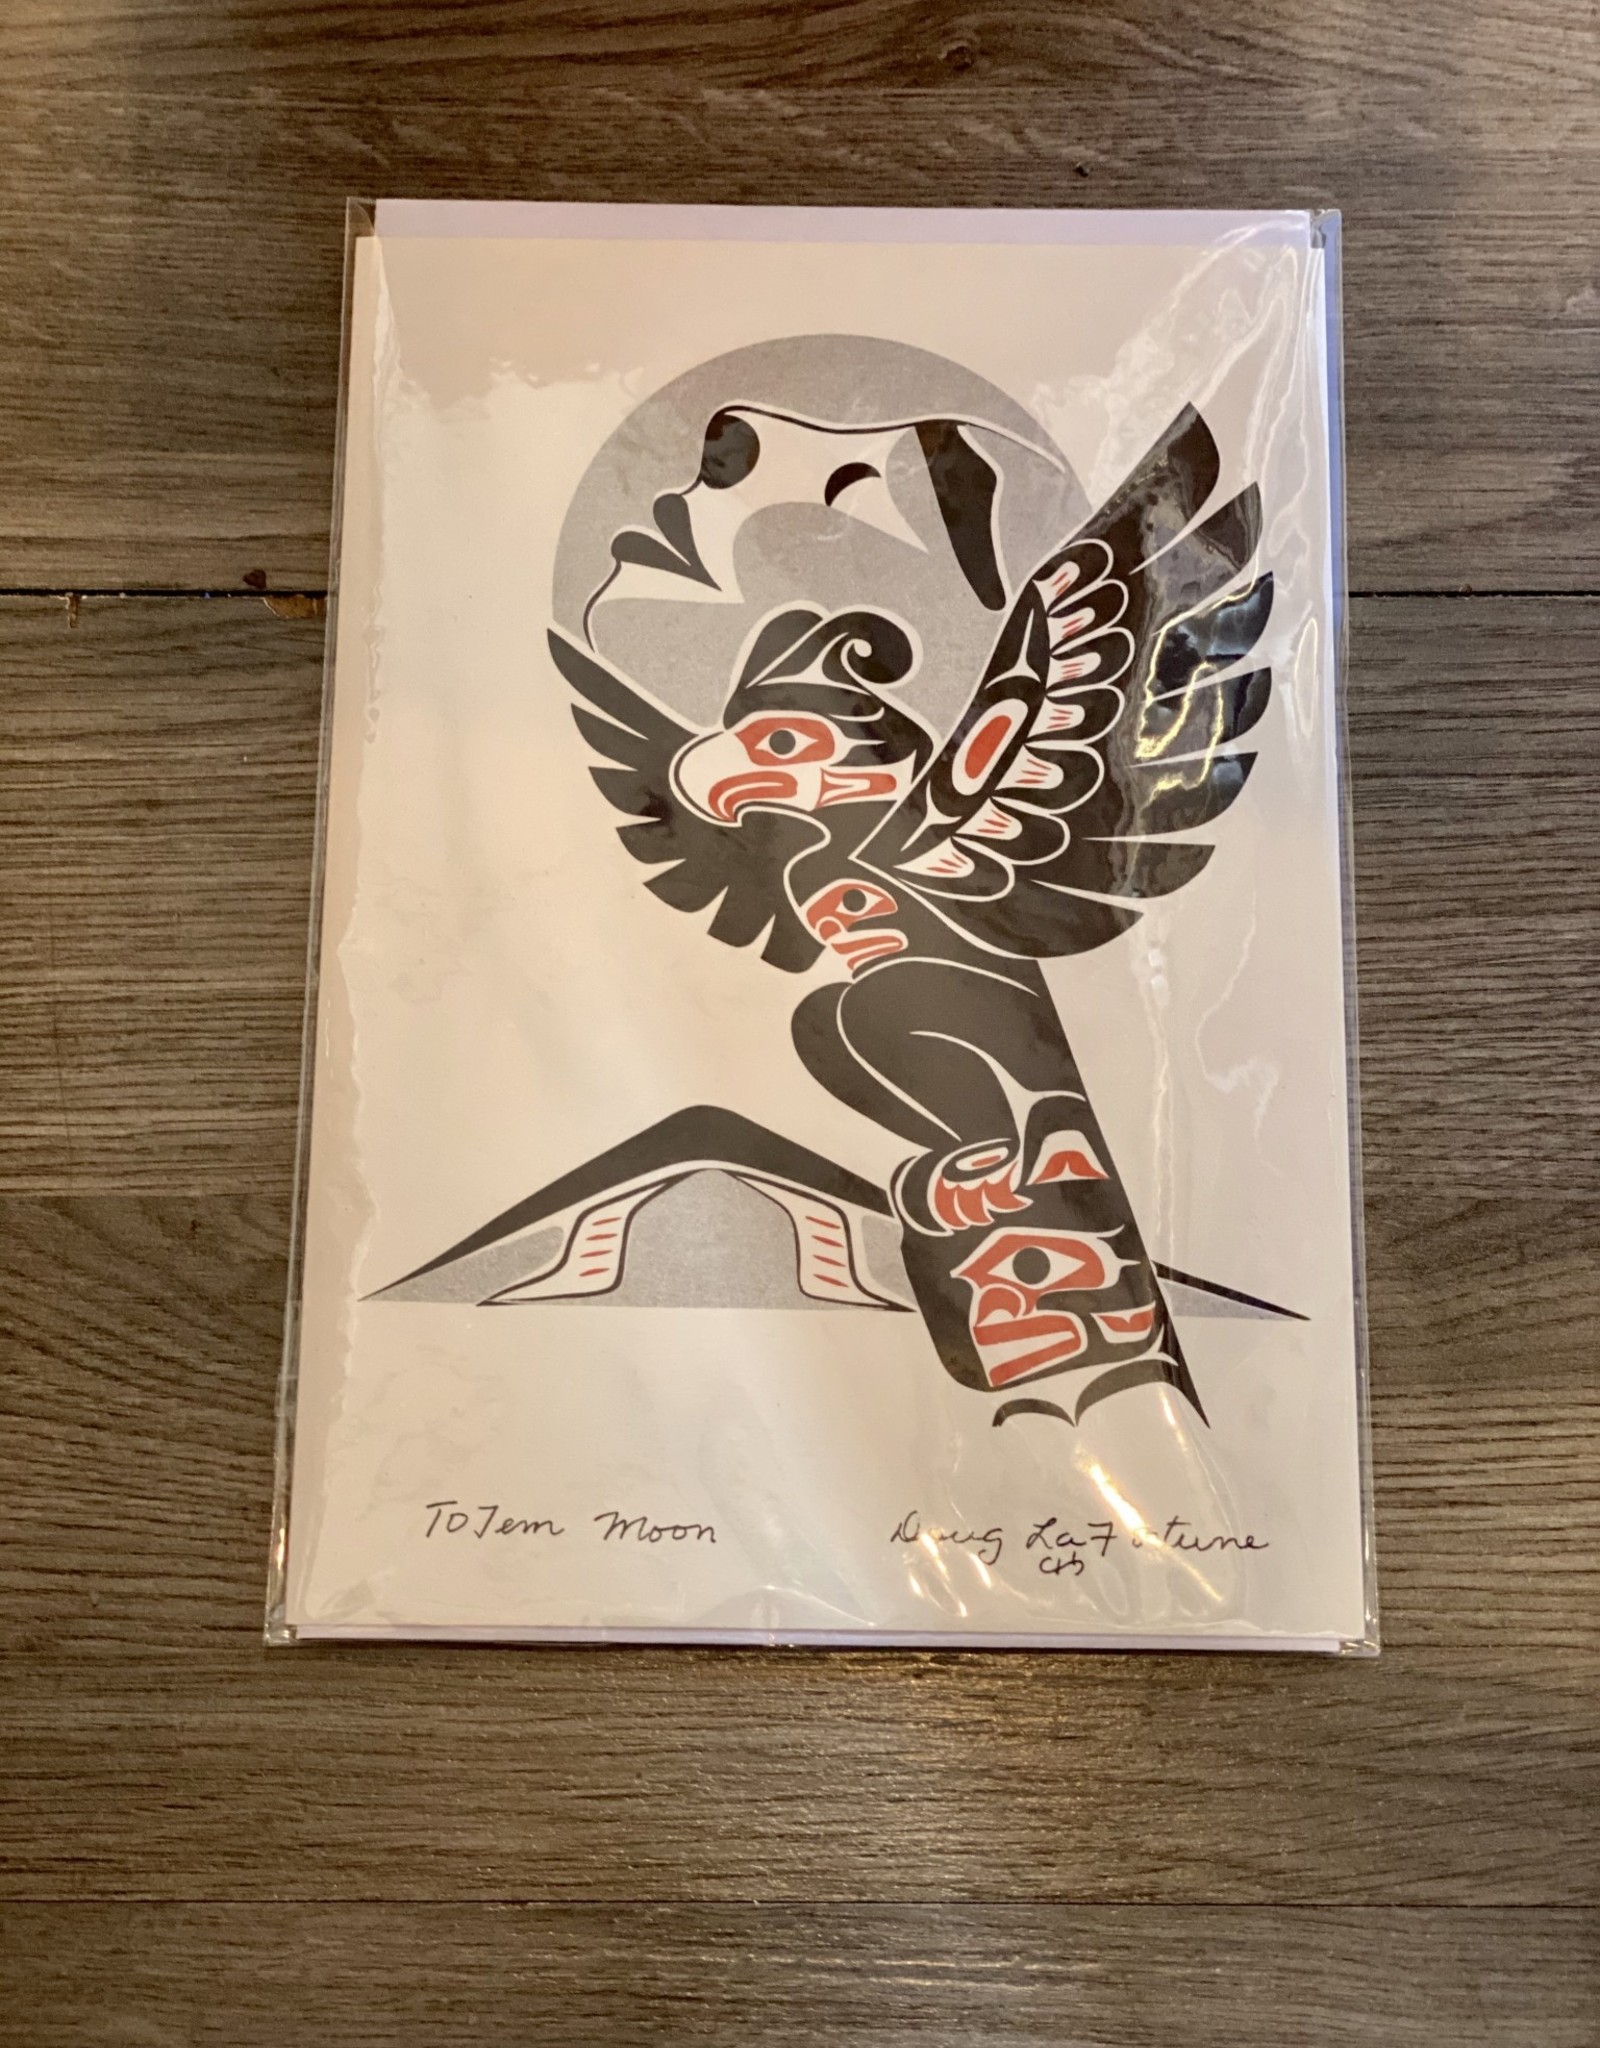 Card - Totem Moon